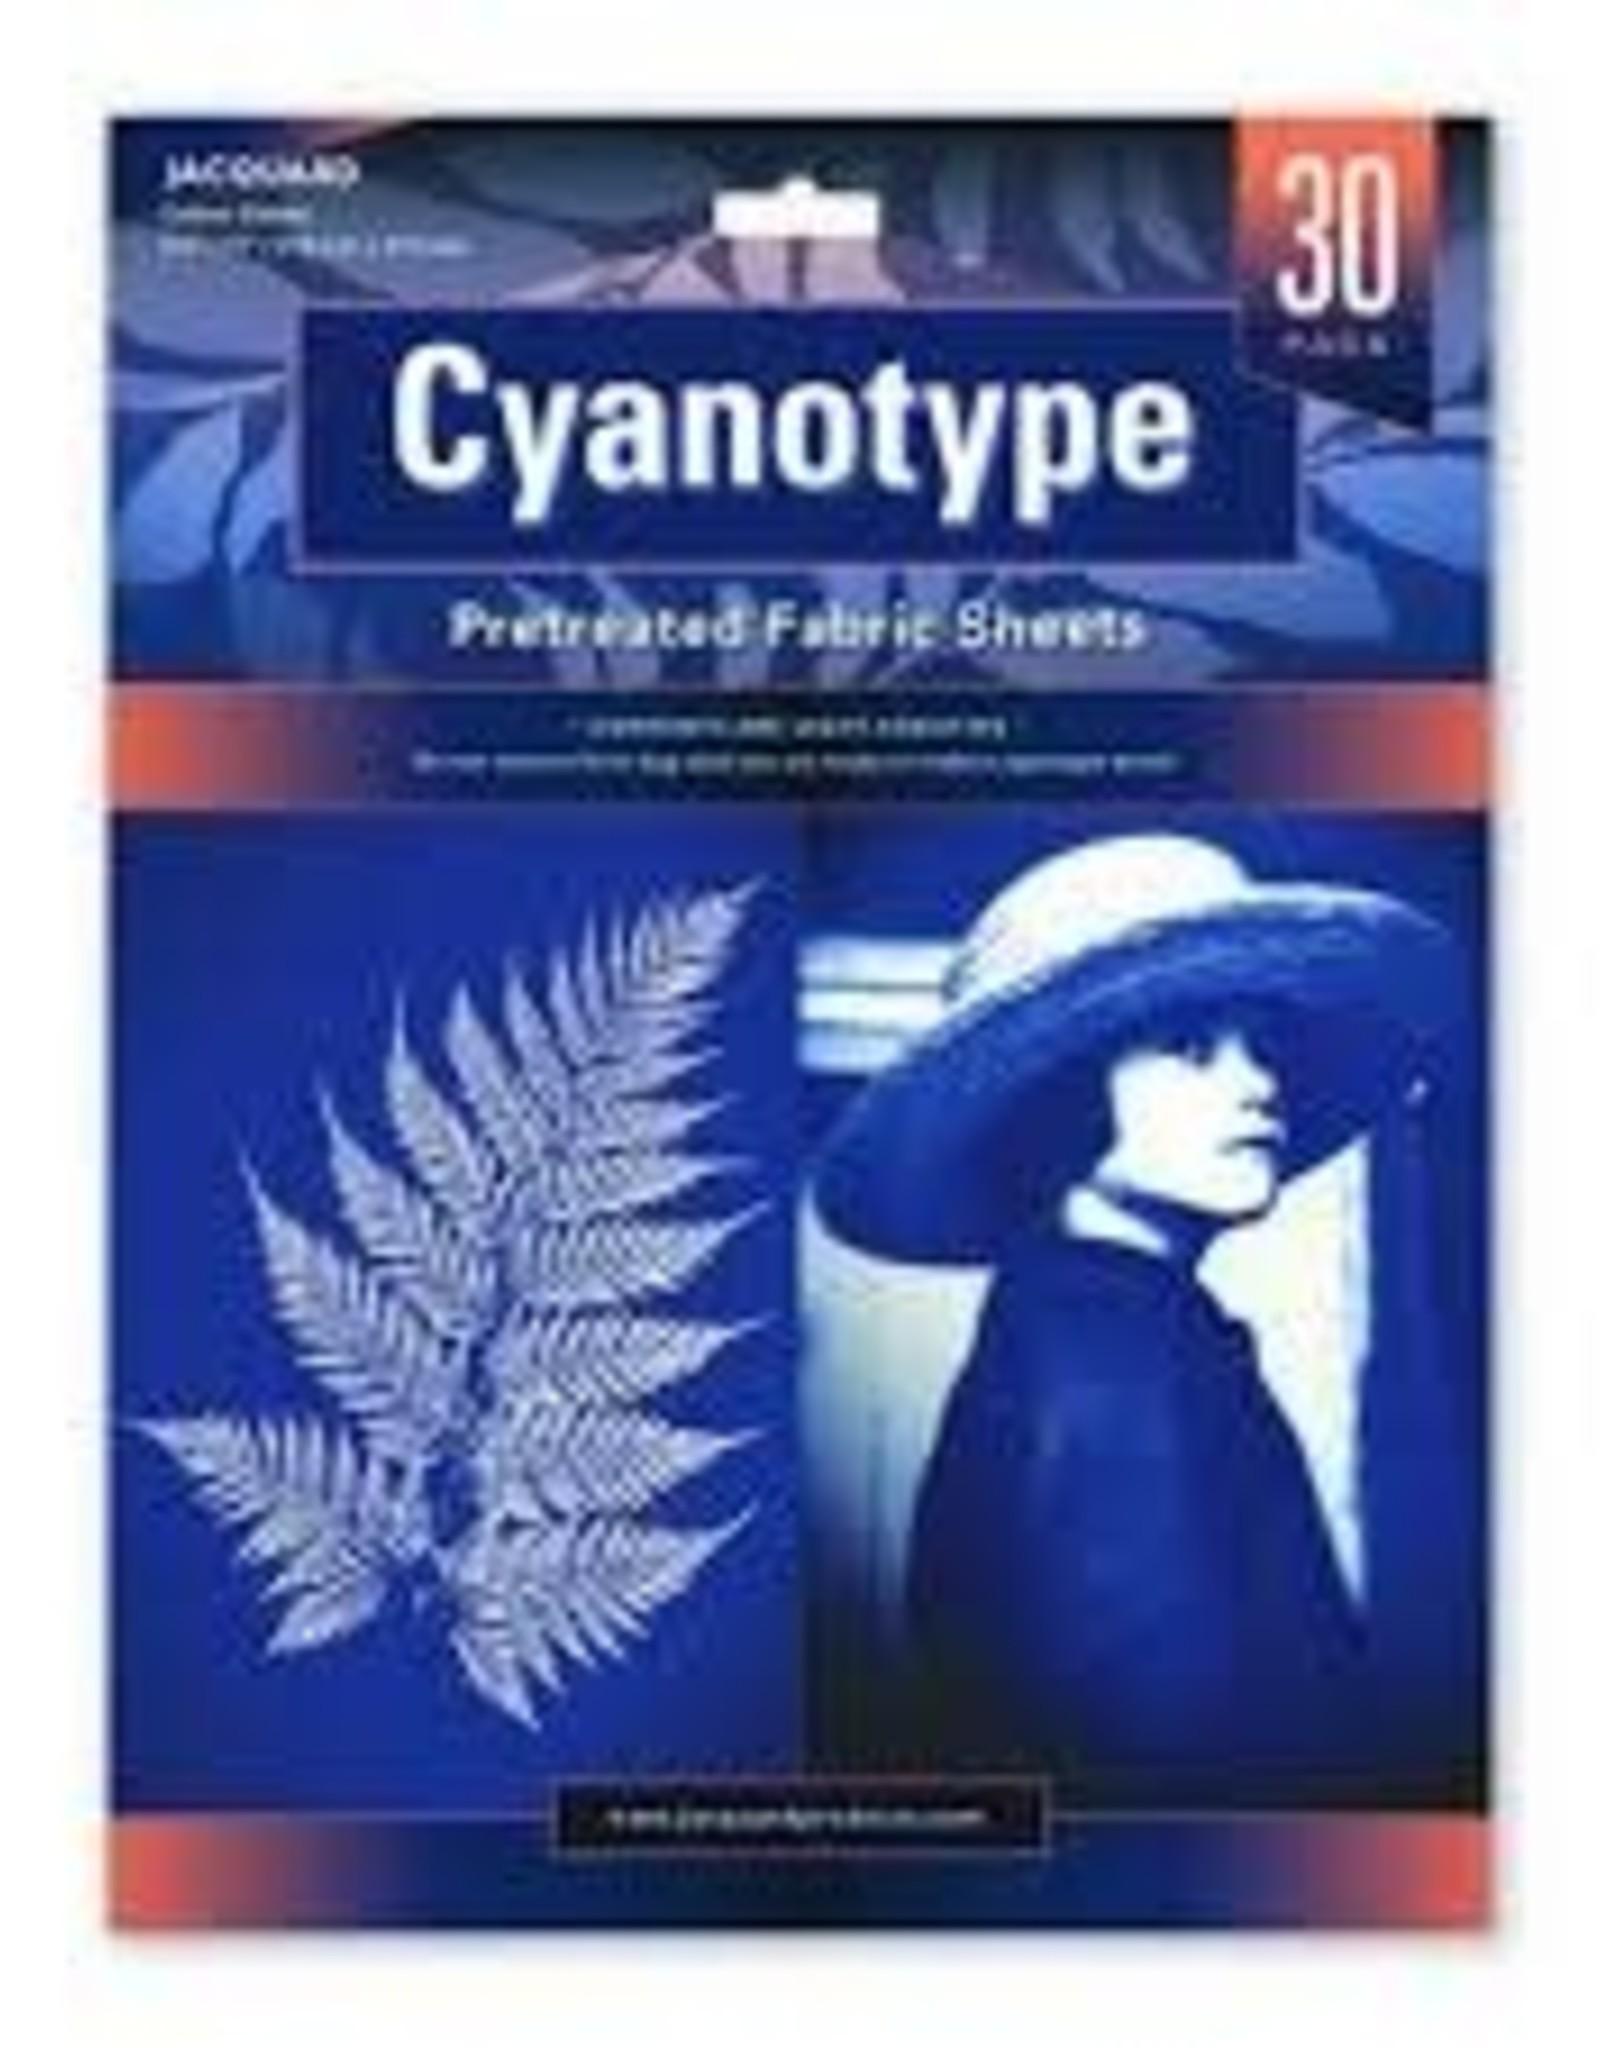 Jacquard Cyanotype Pretreated Fabric 30 Sheets